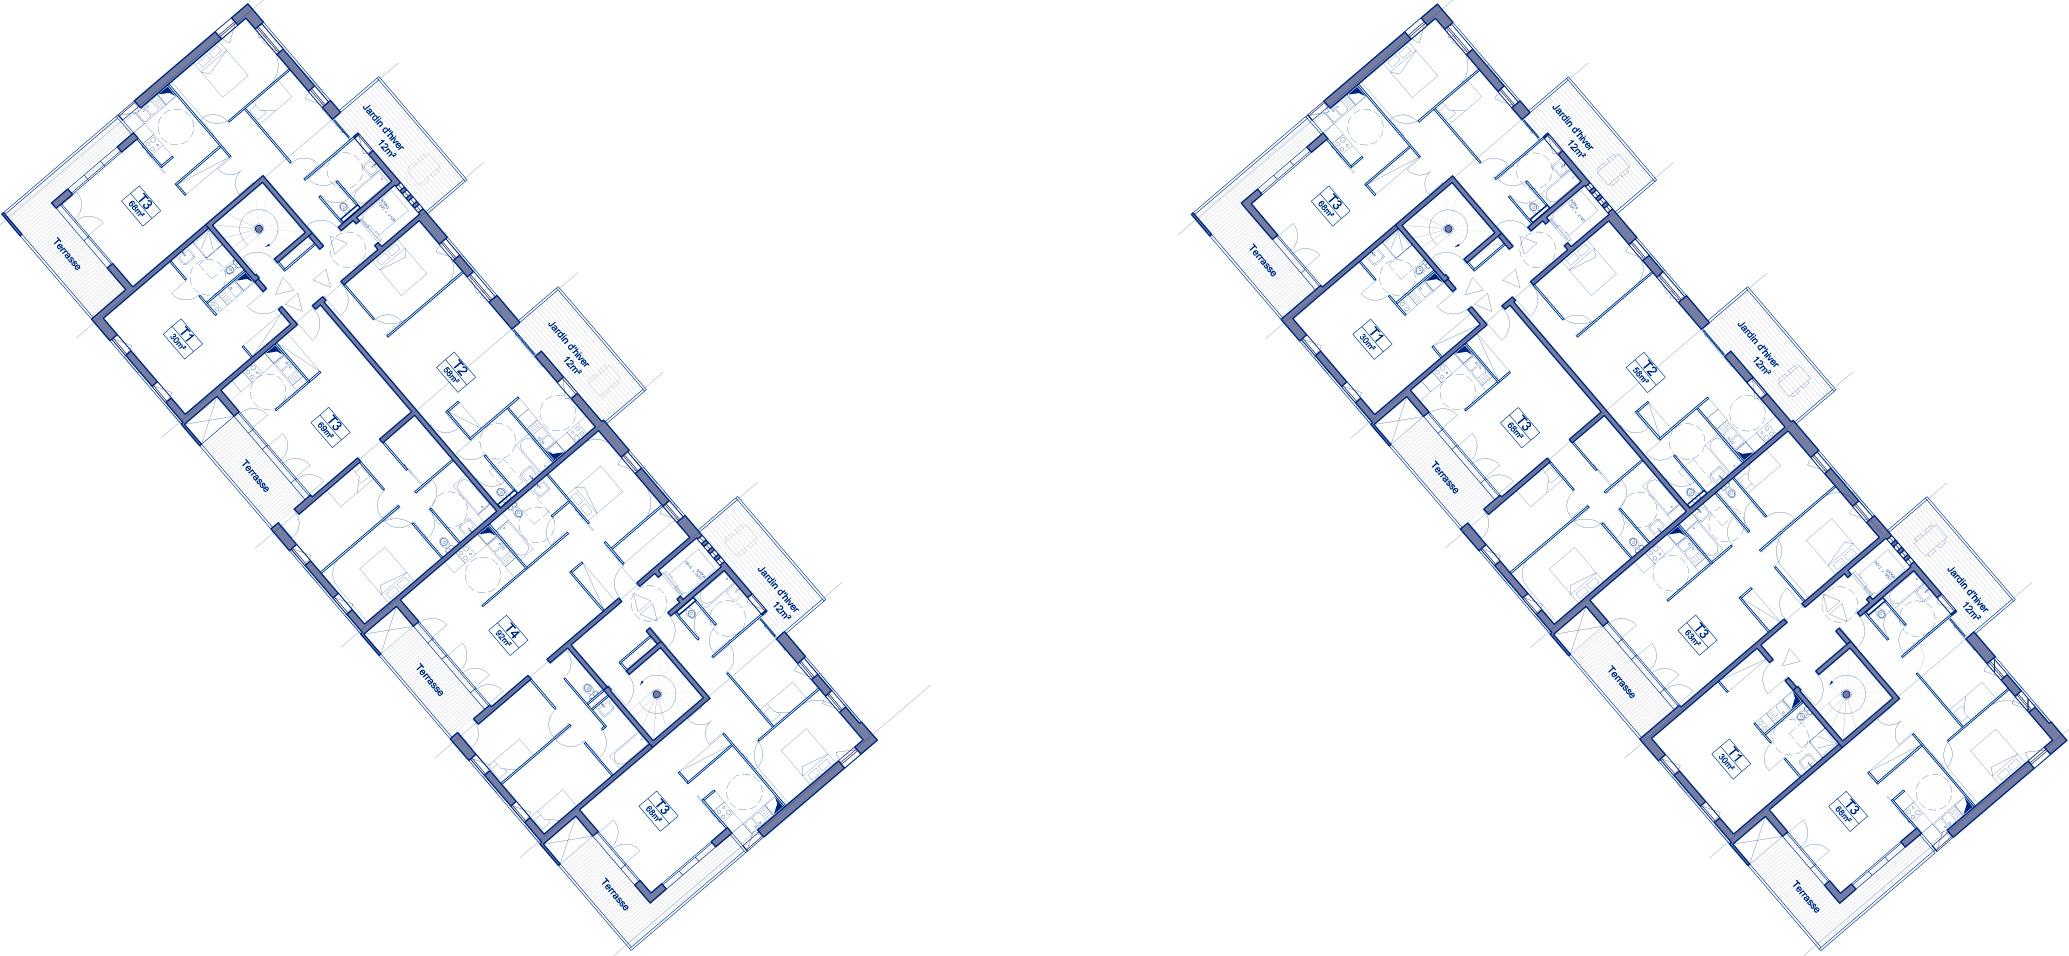 Plan-etages-courants-mariniers